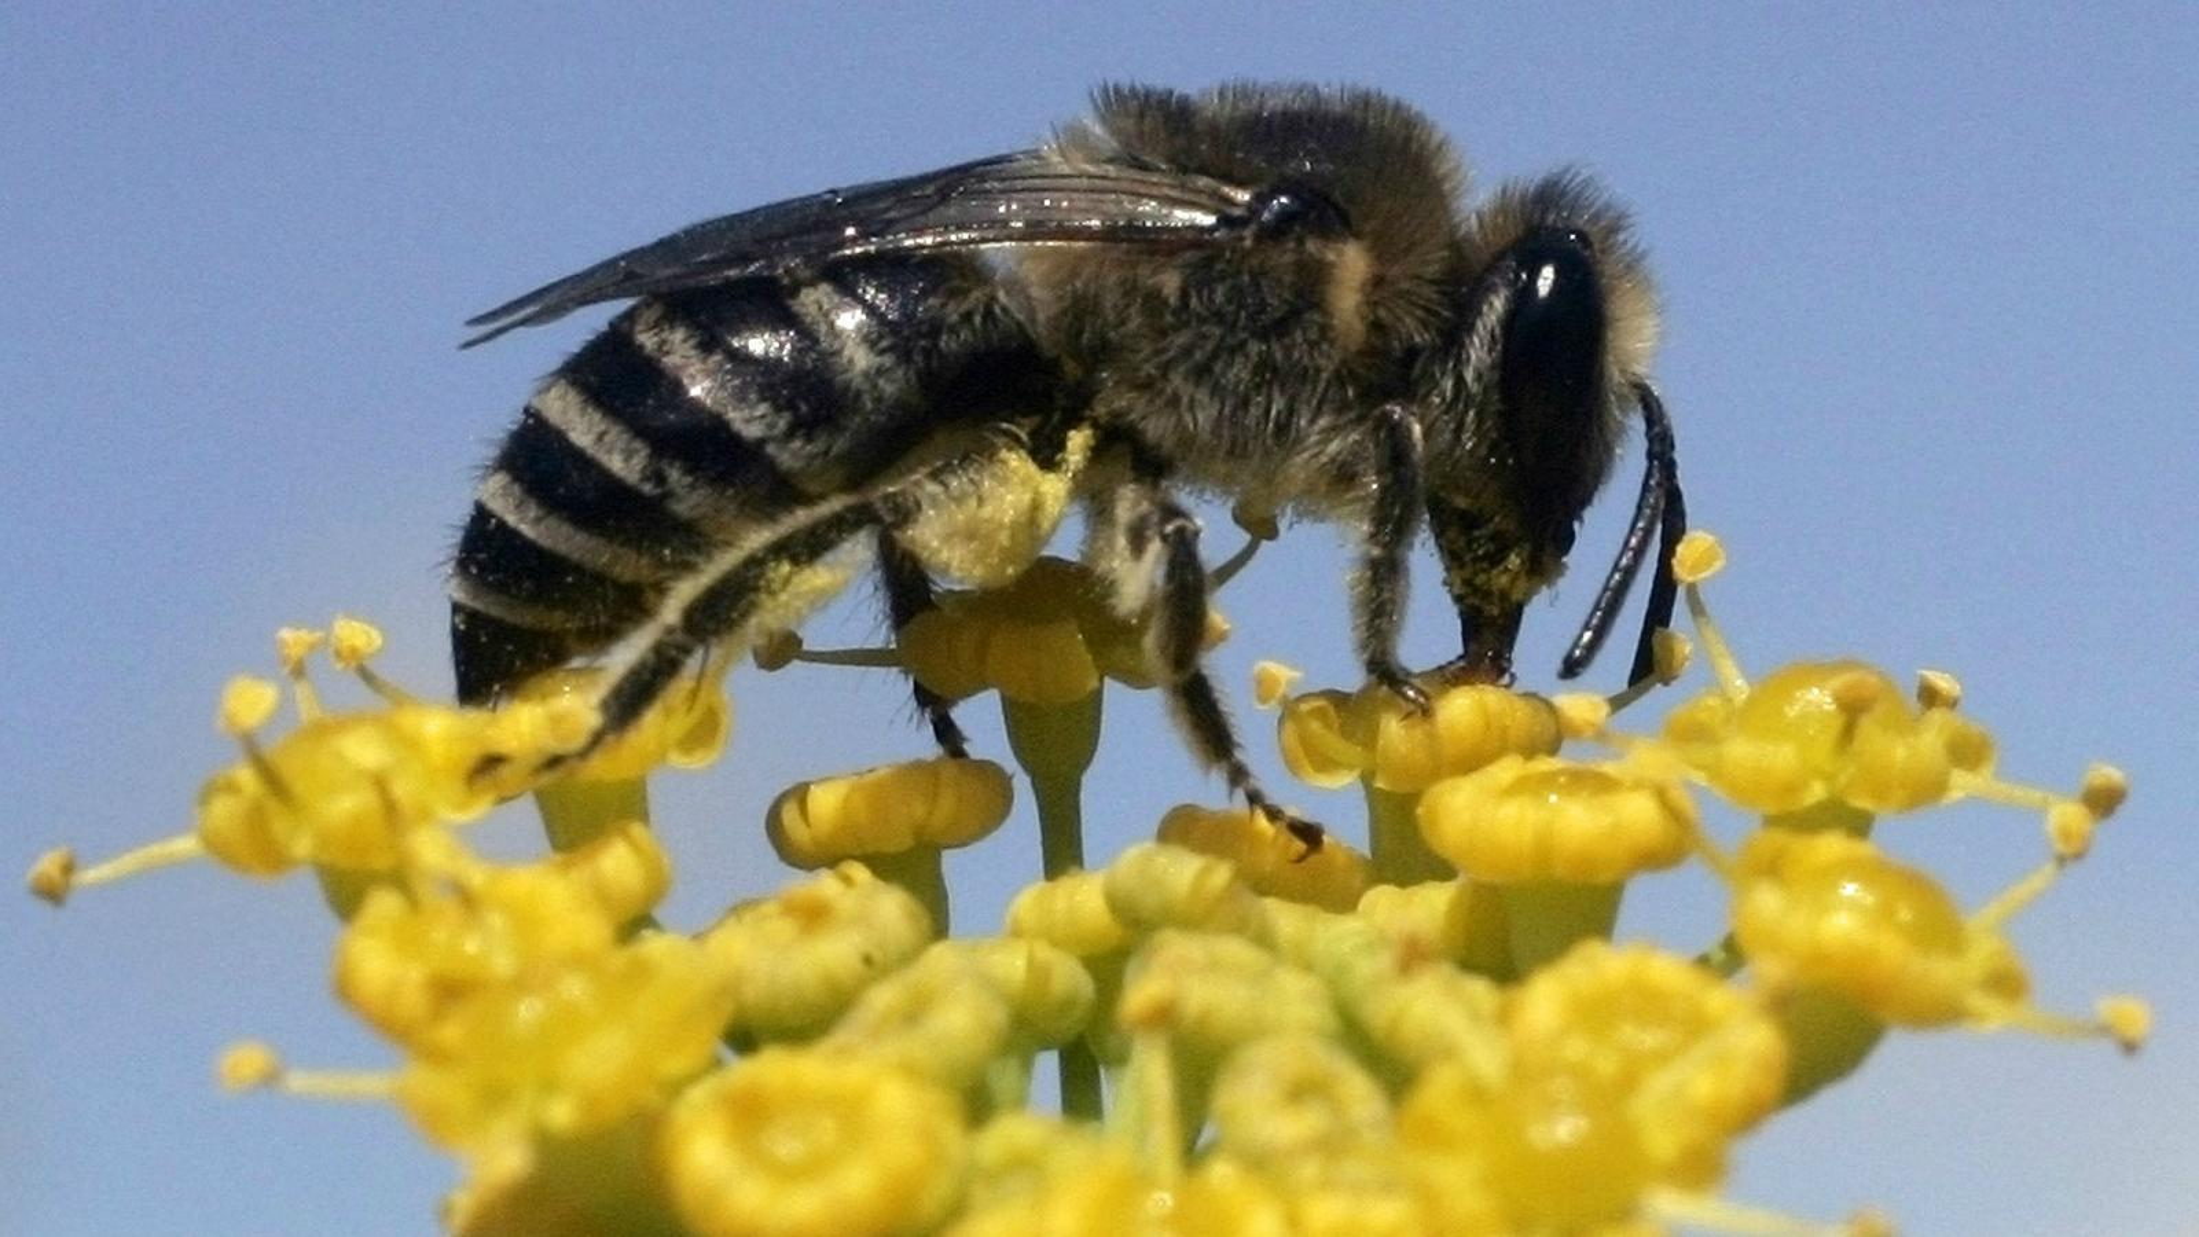 http://hrvatskifokus-2021.ga/wp-content/uploads/2020/07/honeybees-wild-bees-pesticides-ban-varroa.jpg